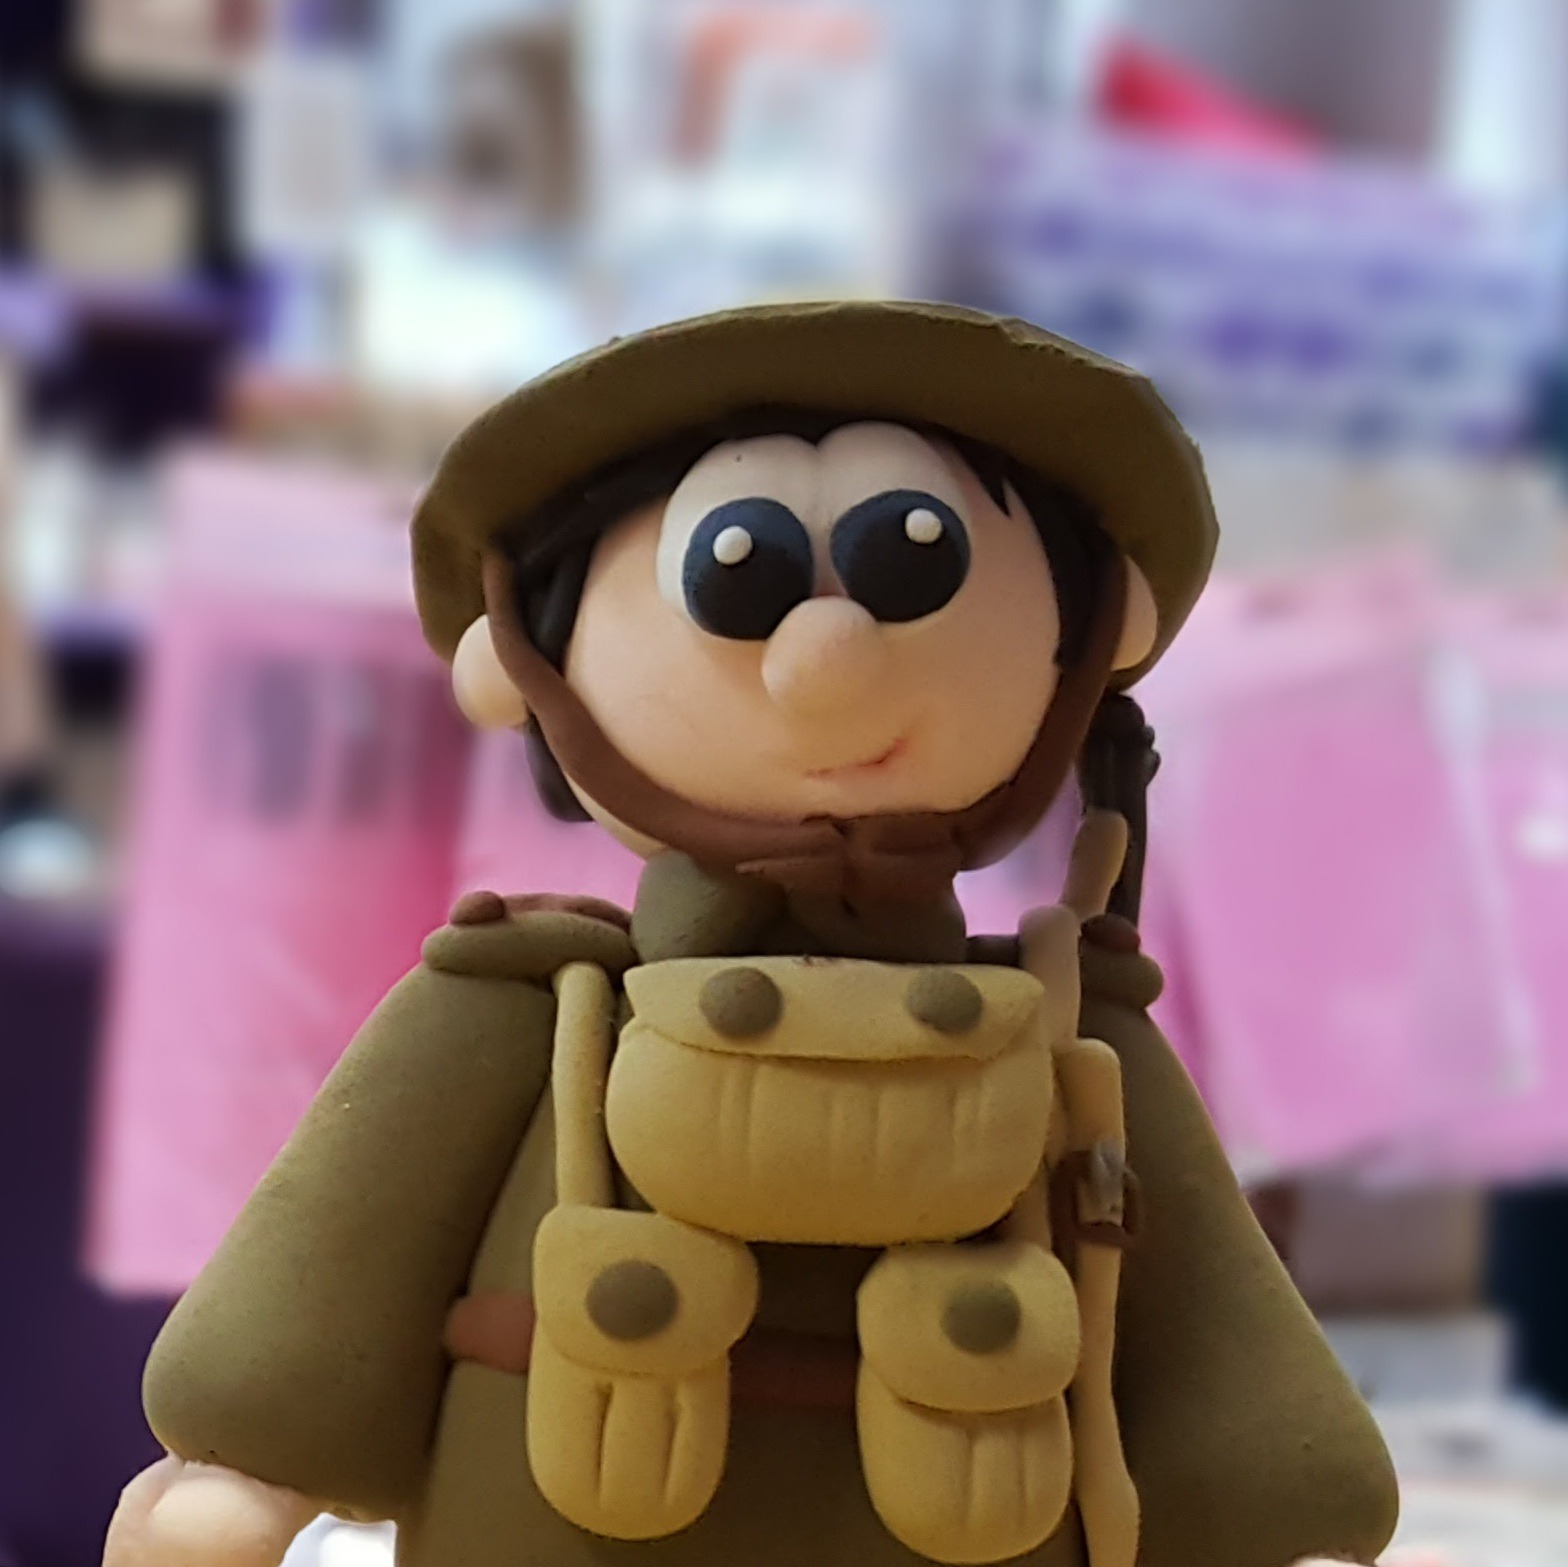 Military Inspired Figurine